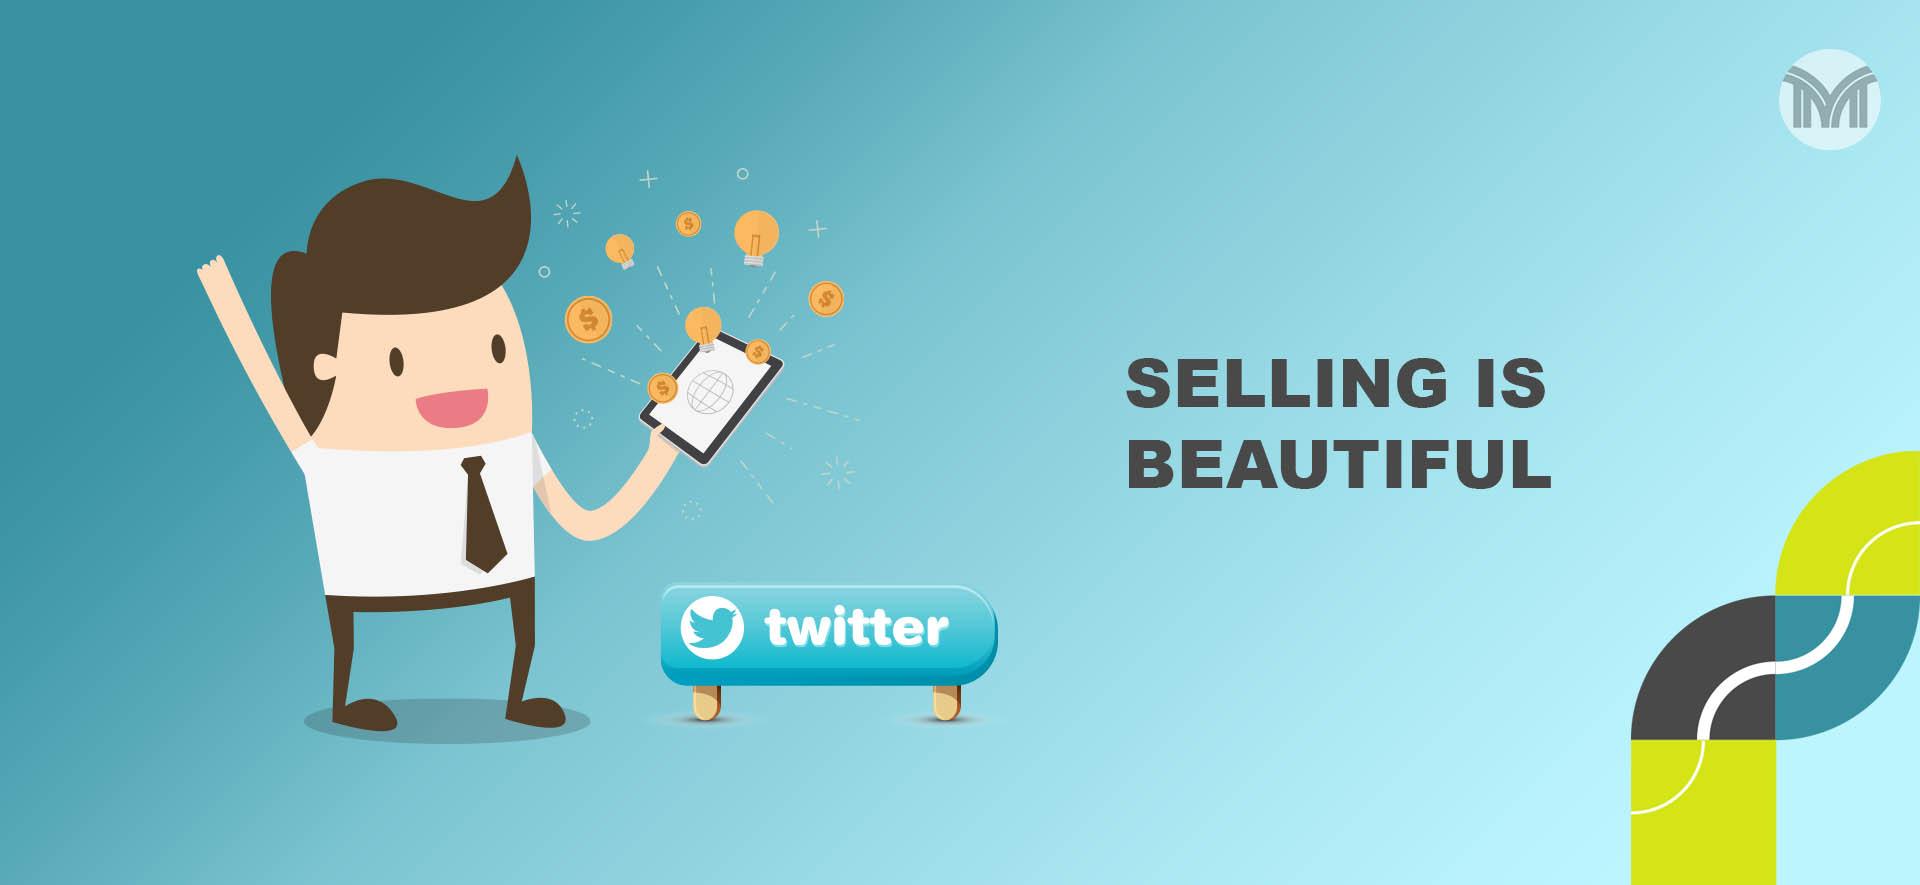 Selling is beautiful | Sales training in India | Mercuri India